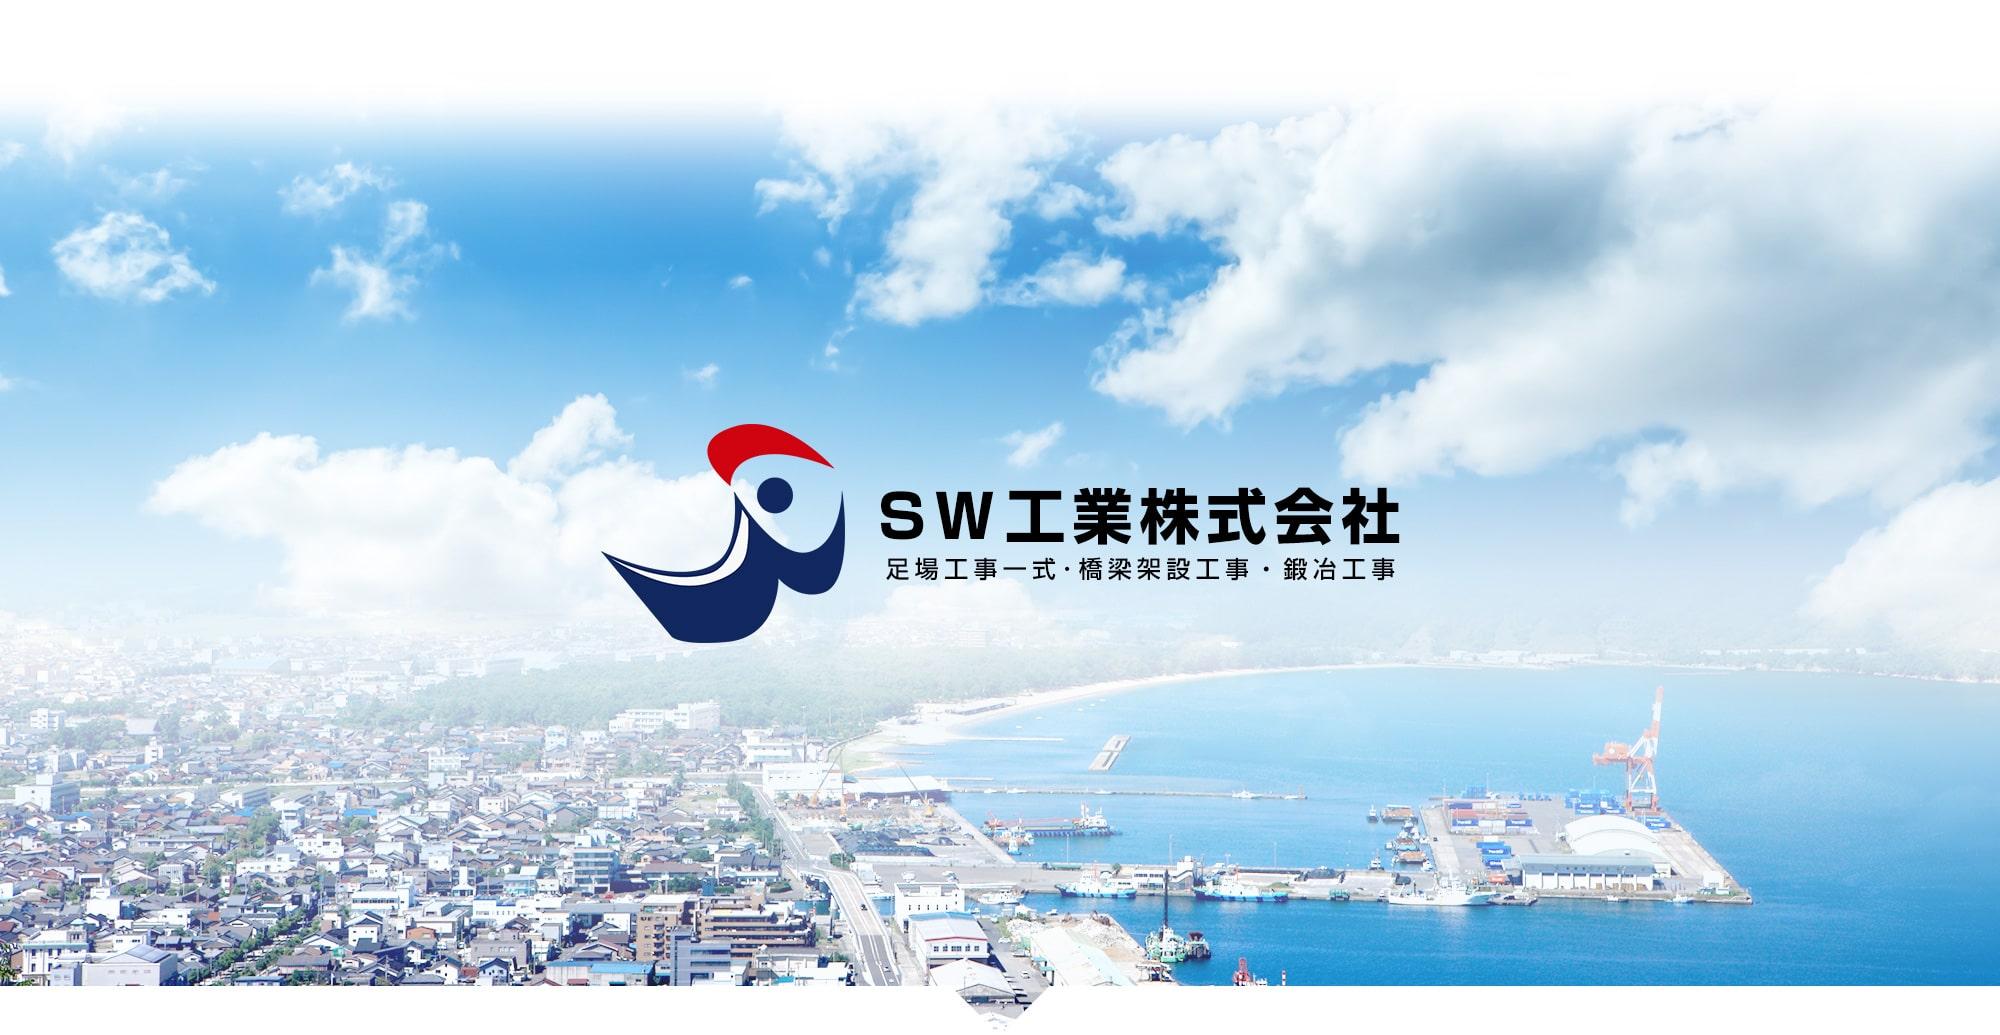 SW工業株式会社 足場工事一式・橋梁架設工事・鍛冶工事